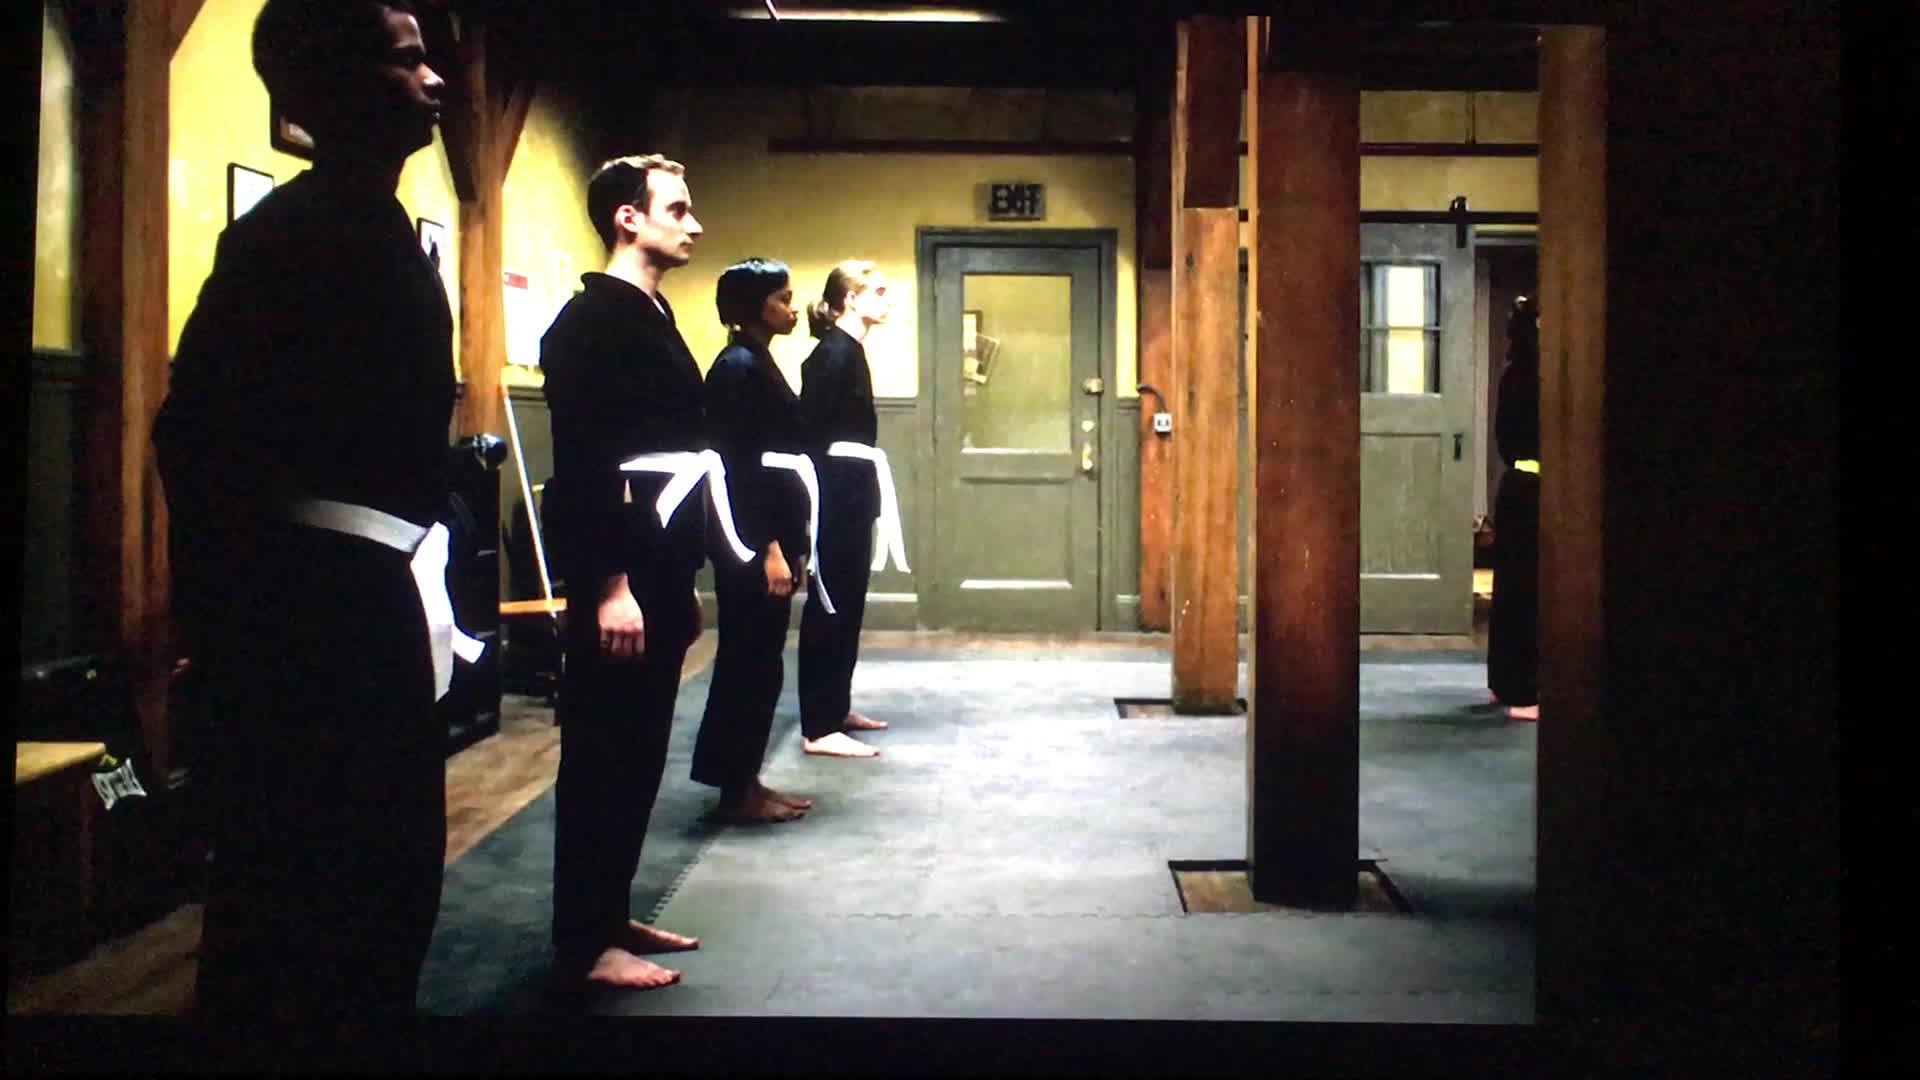 marvelstudios, The Real Iron Fist GIFs